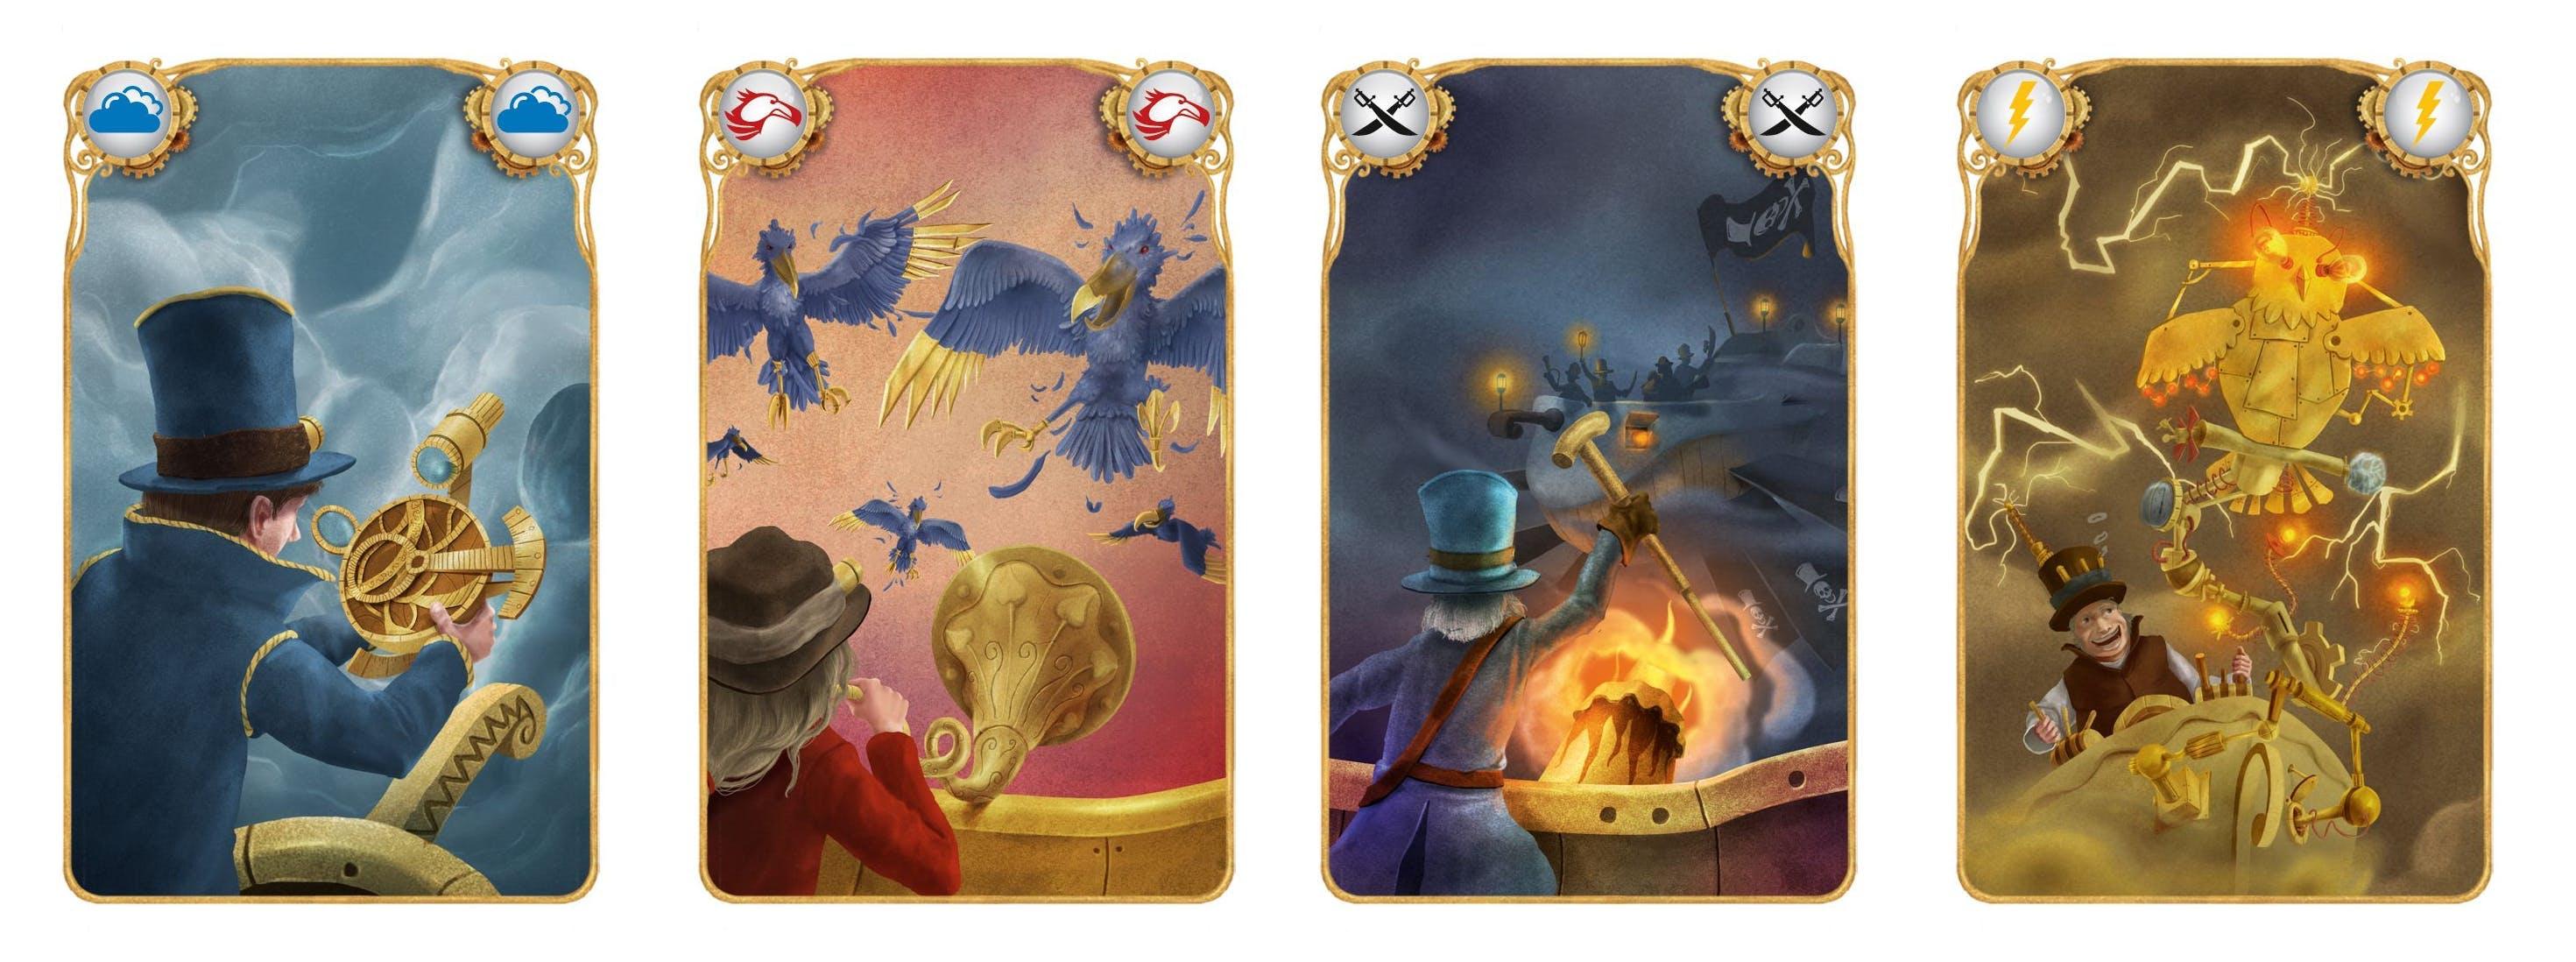 Celestia - cartes de jeu